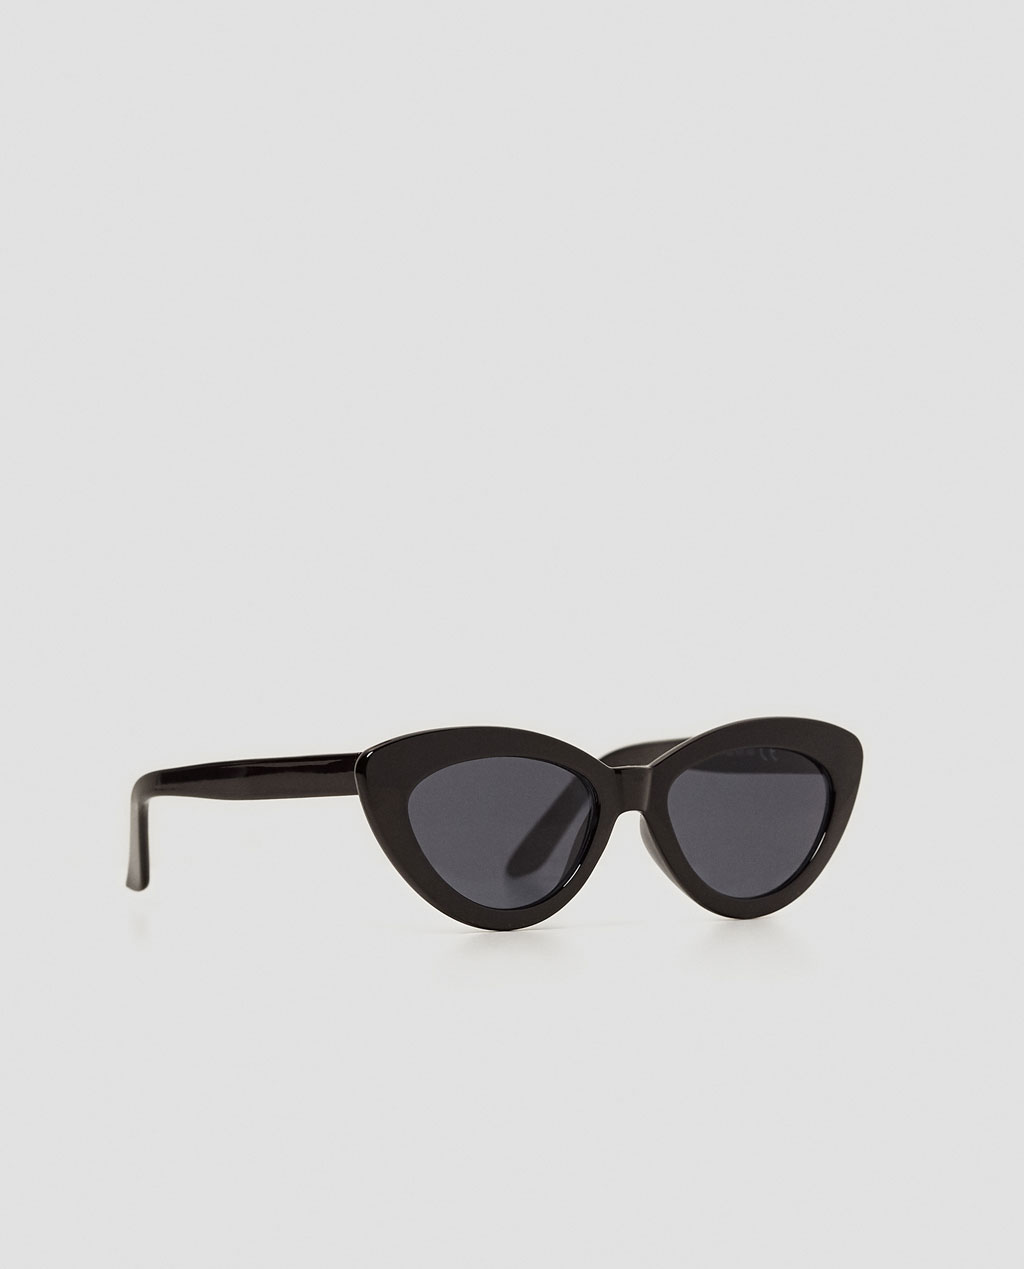 cateye sunglasses $22